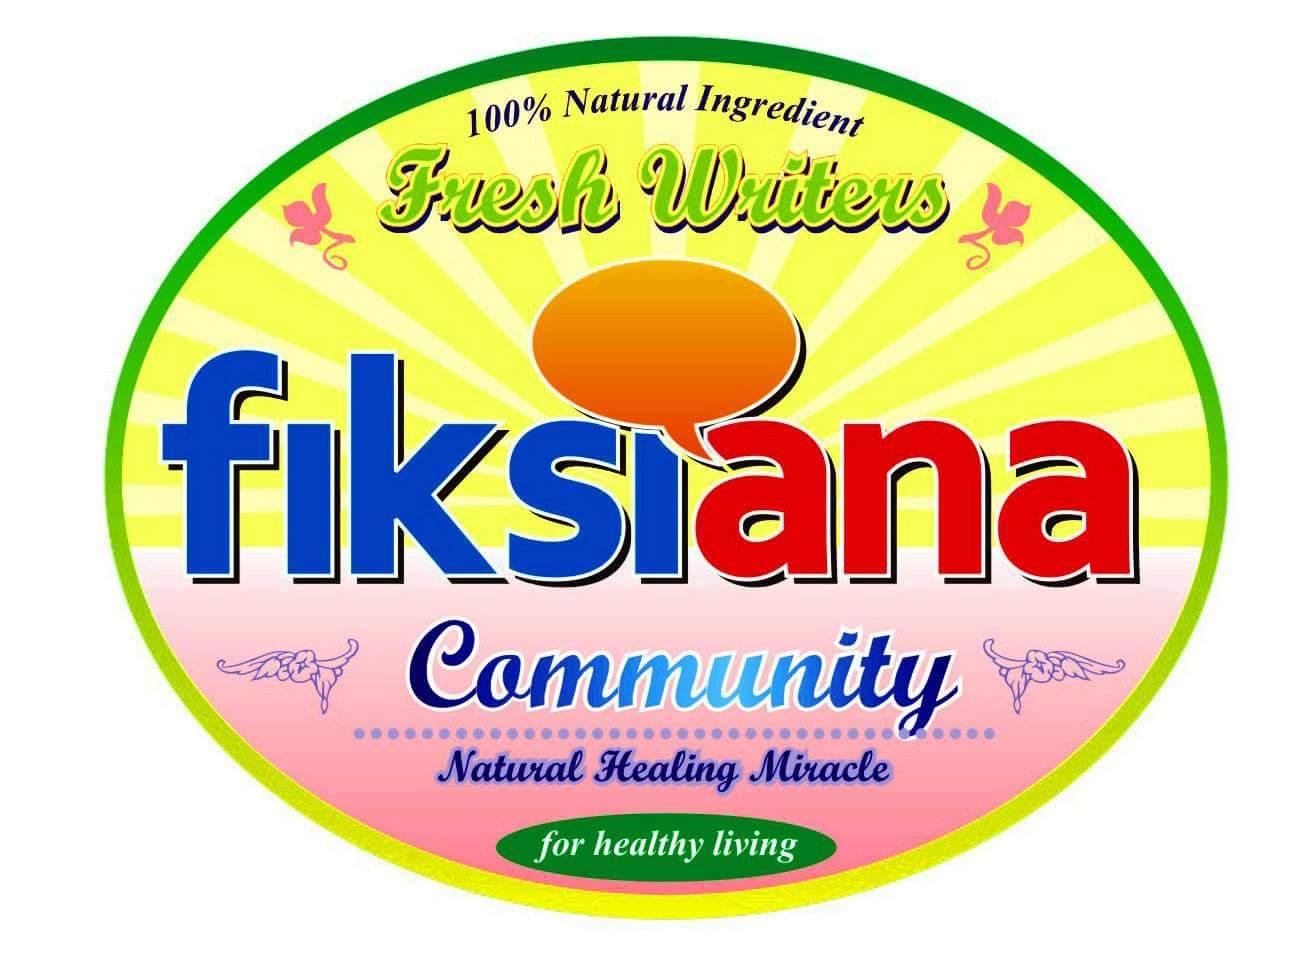 items/kaleidoskop_2019/2-fiksiana-community-1577687345.jpeg